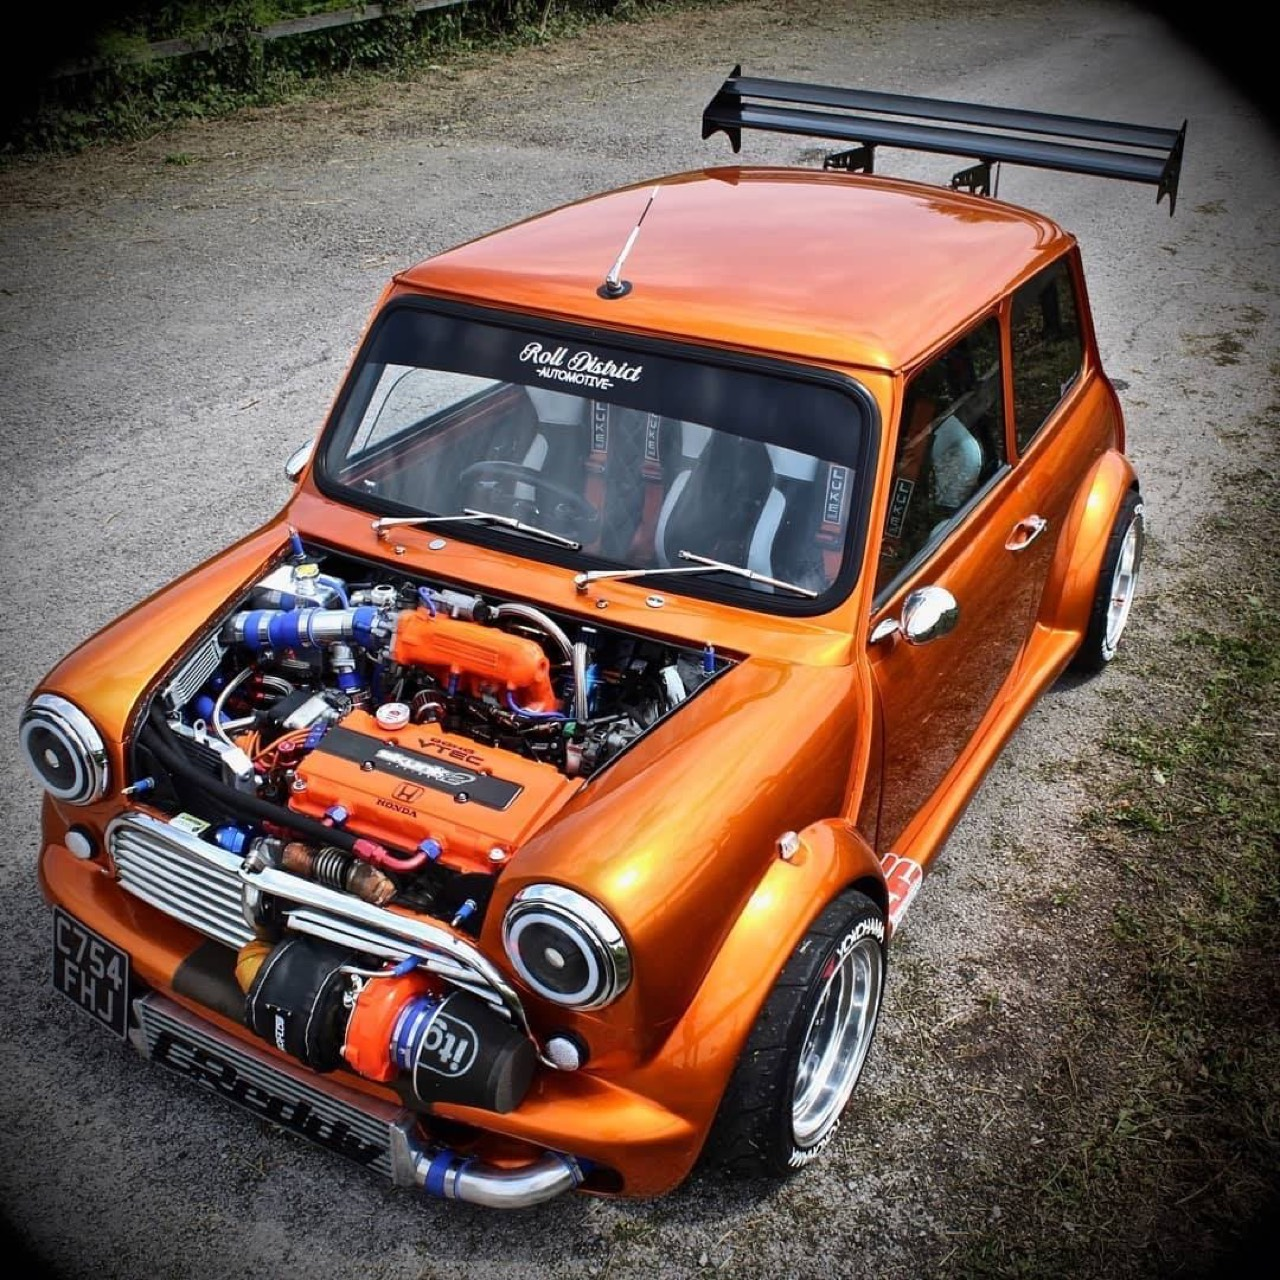 Austin Mini B16 Turbo... Shootée aux hormones ! 4